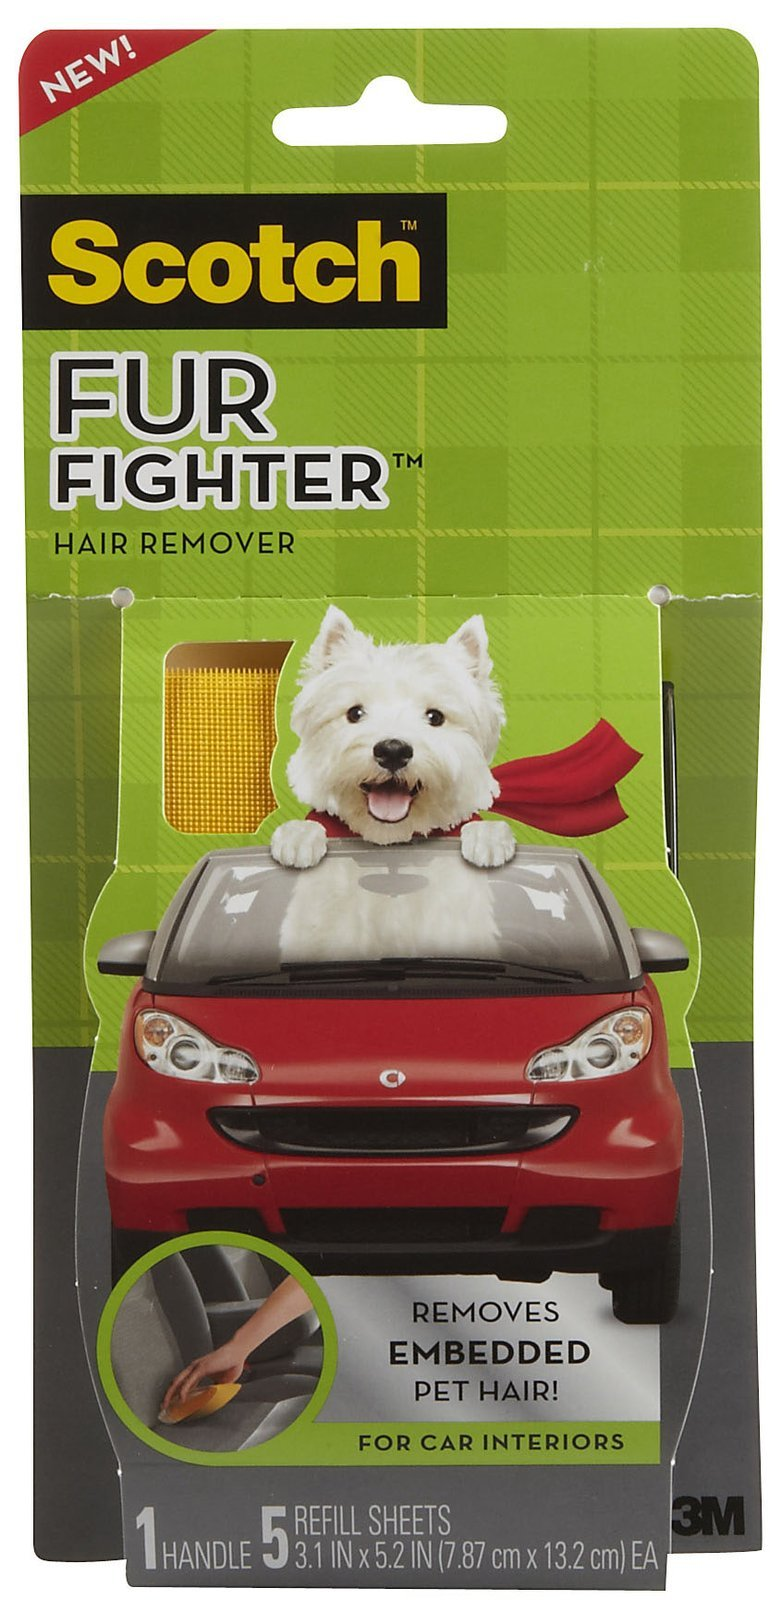 Scotch(TM) Fur Fighter(TM) Hair Remover by Scotch